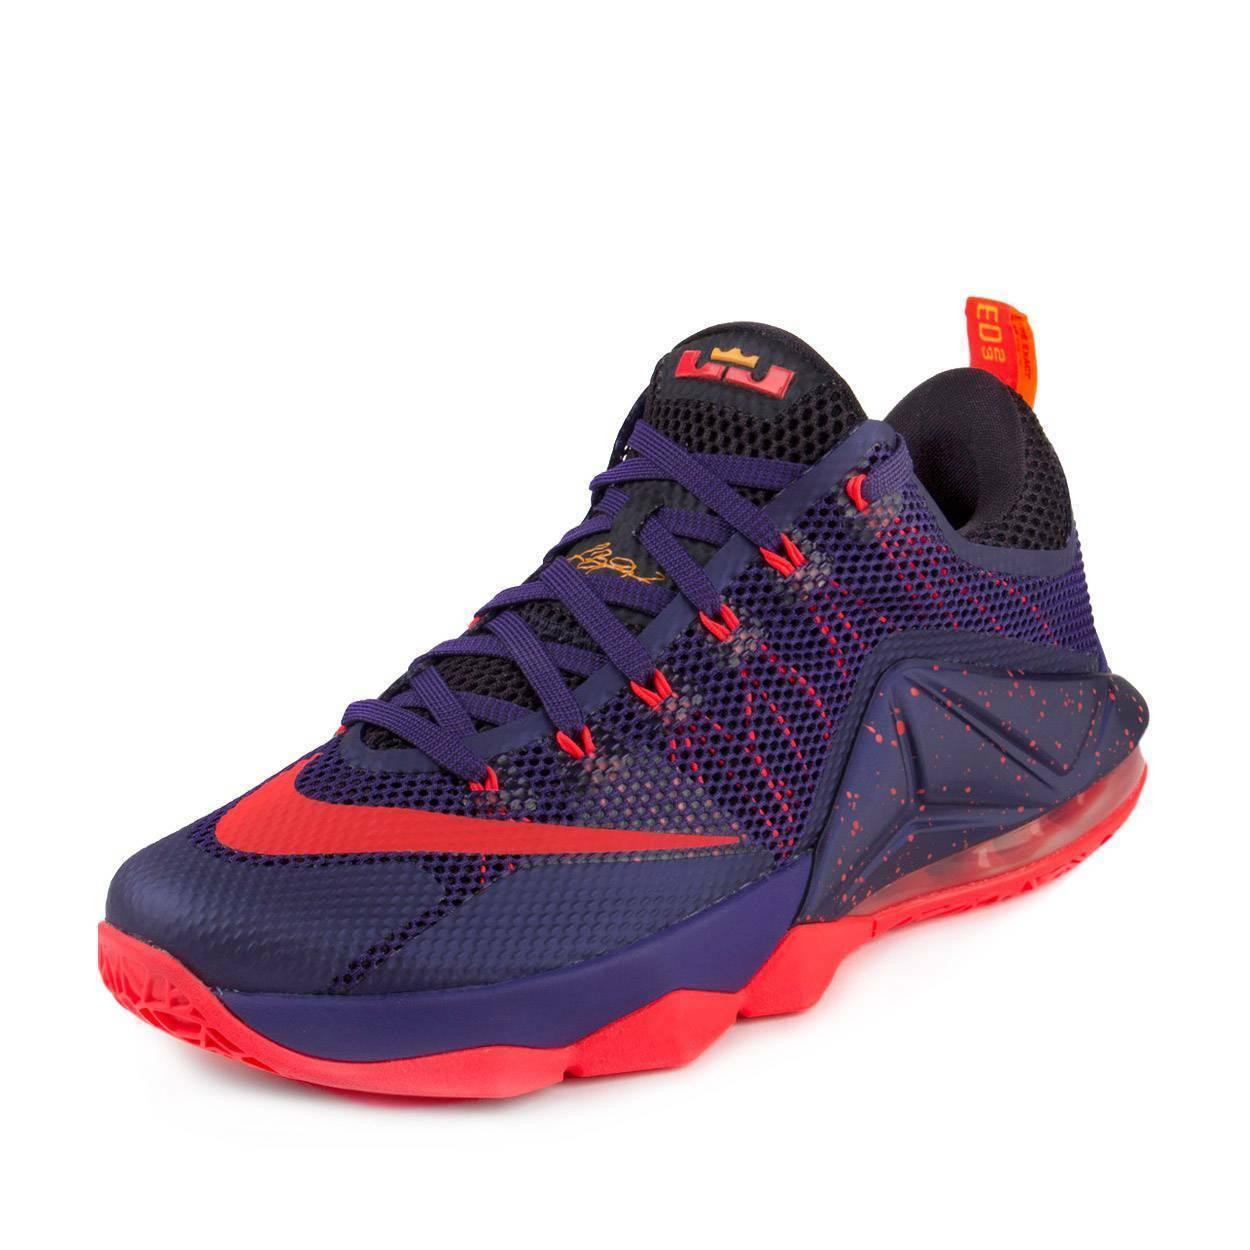 Nike Lebron XII Low Raptors Court Purple Bright Crimson 724557-565 Mens 9 image 4